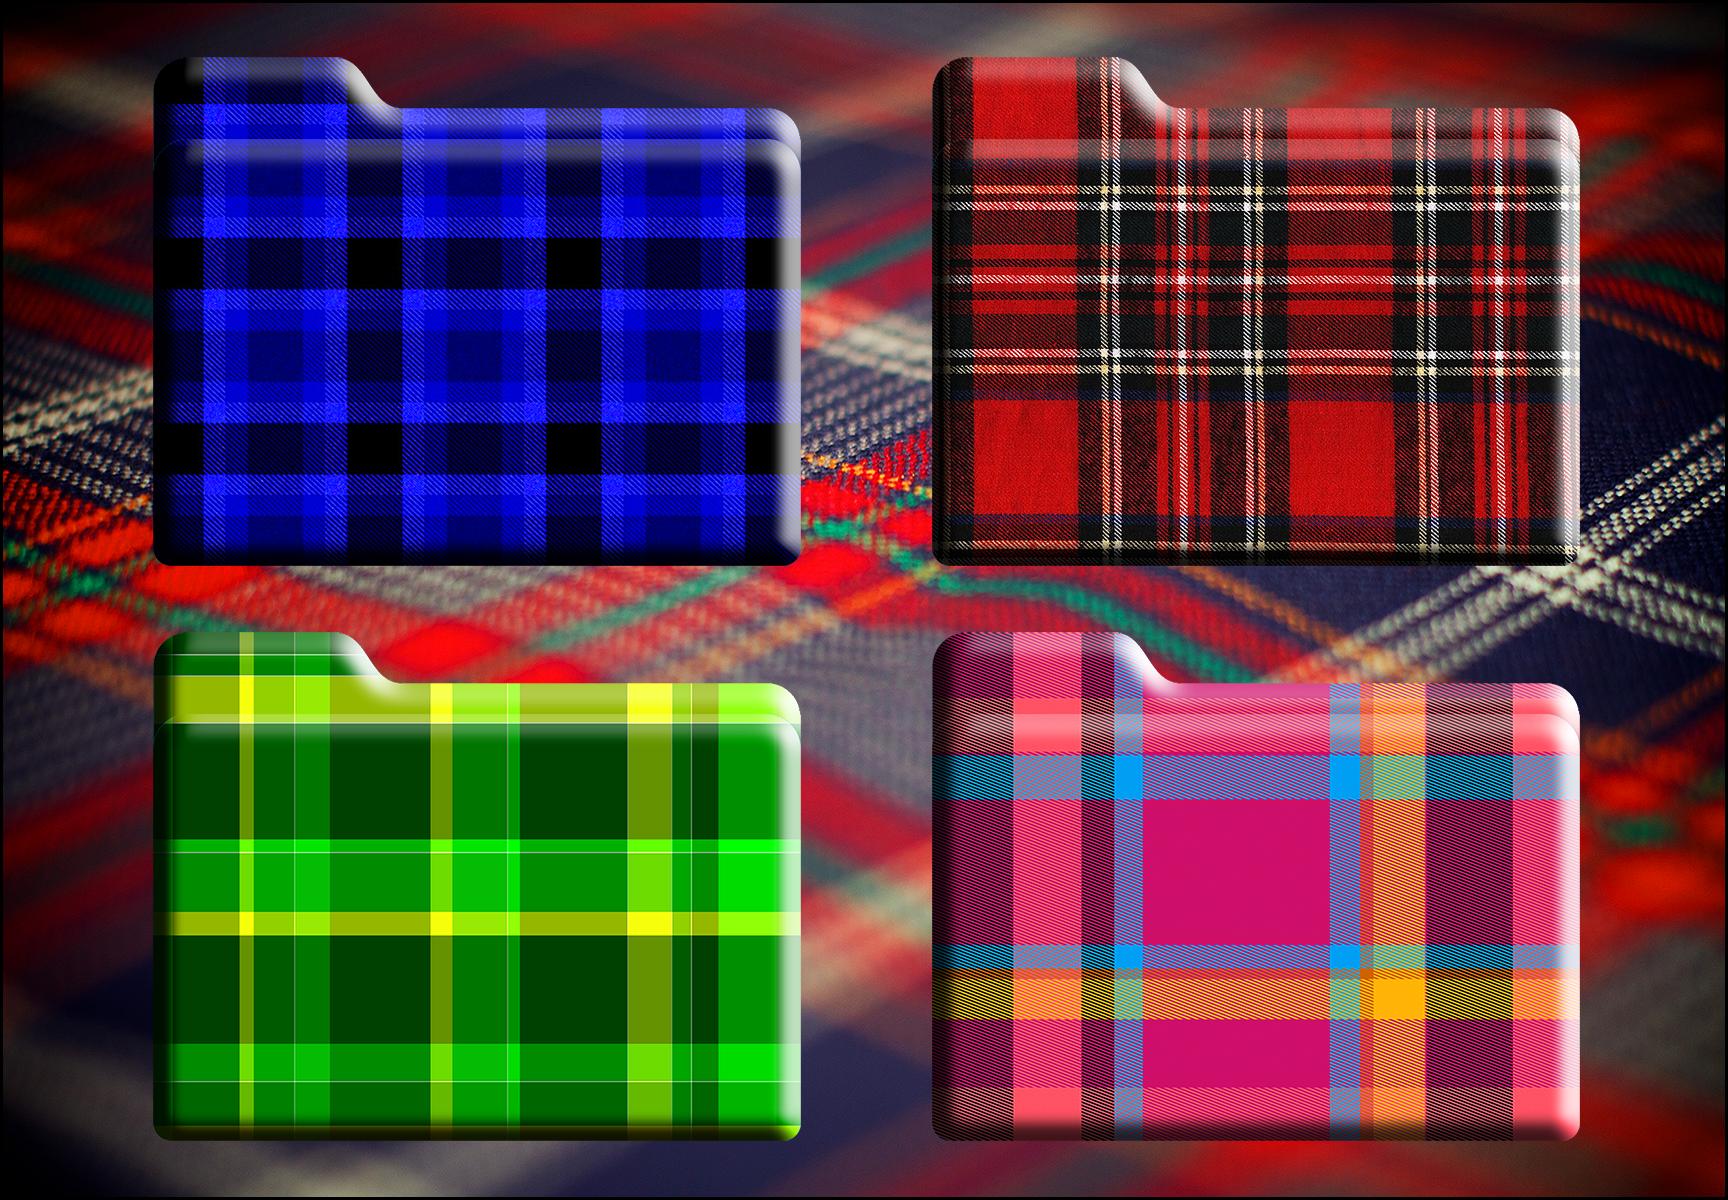 Tartan hd folder icons mac and windows by scottydog332 for Tartan wallpaper next